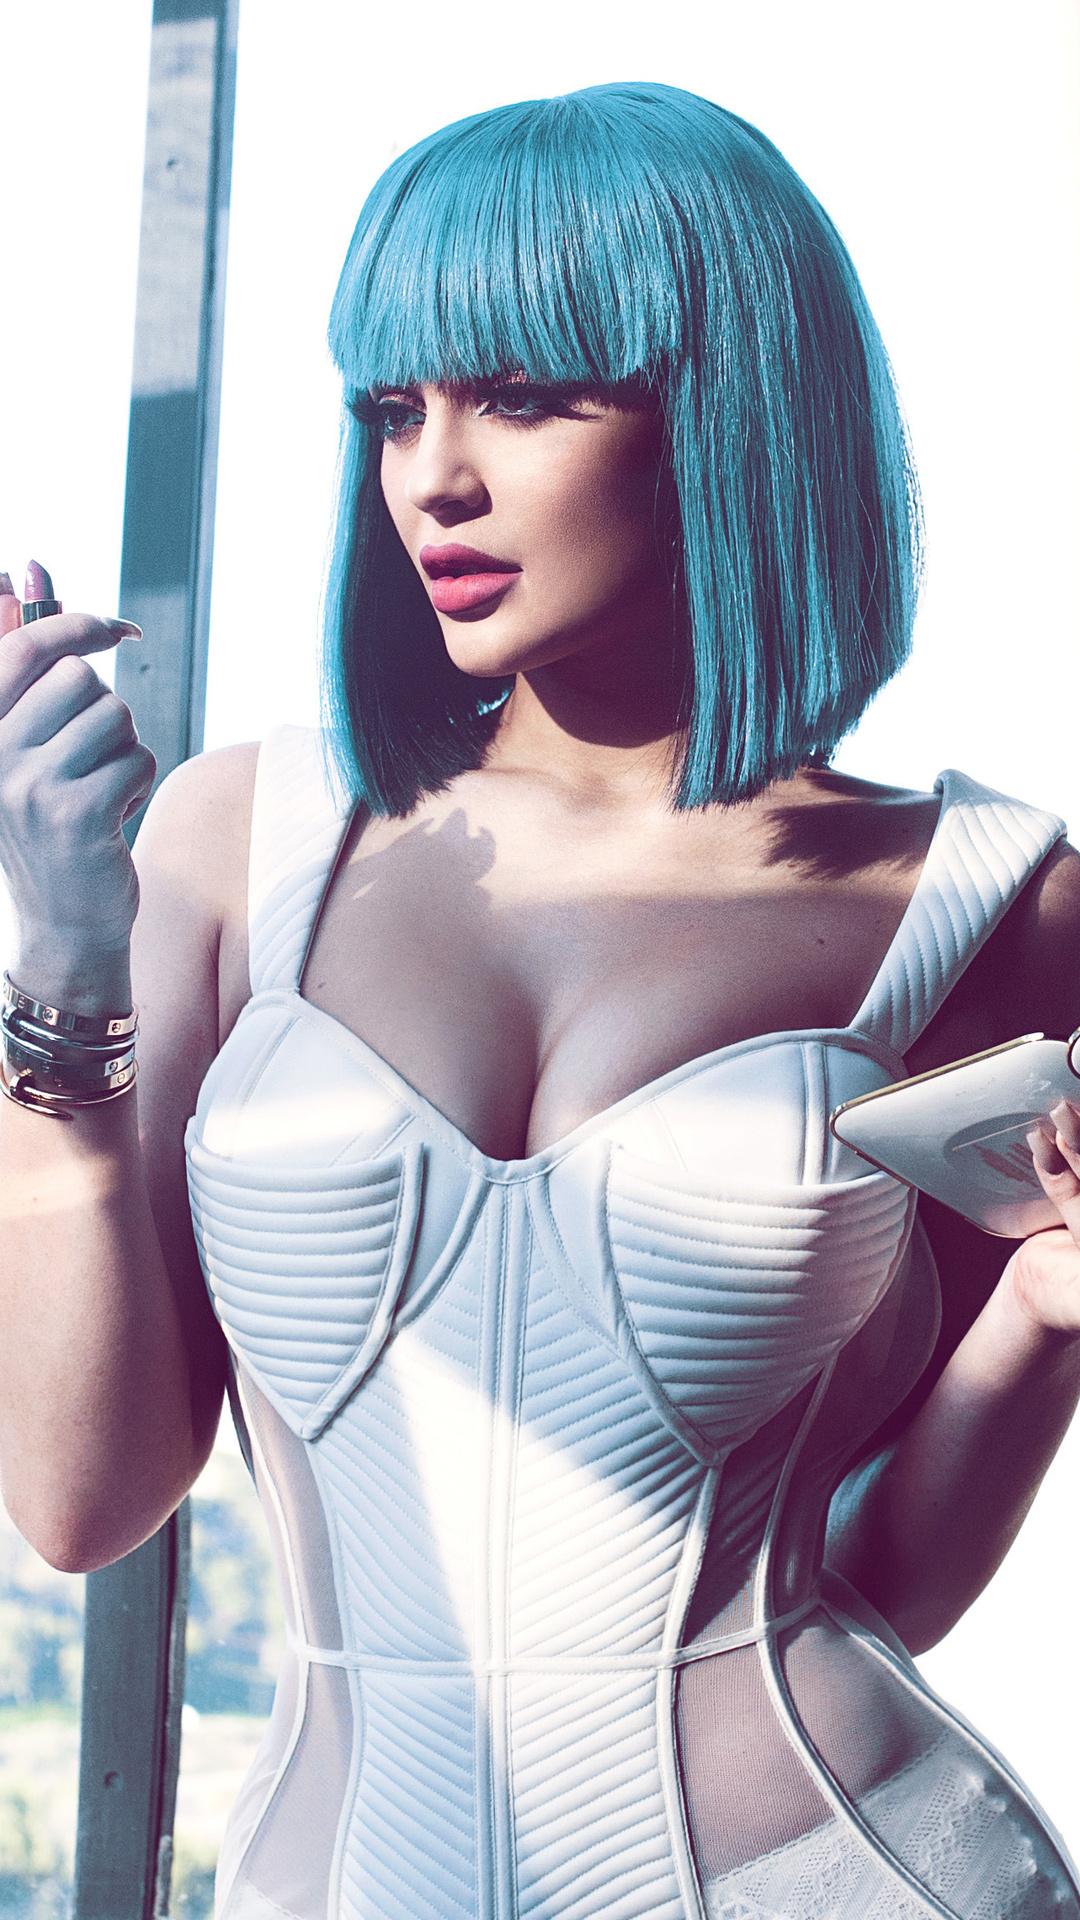 kylie-jenner-cotton-candy-blue-hair-zc.jpg